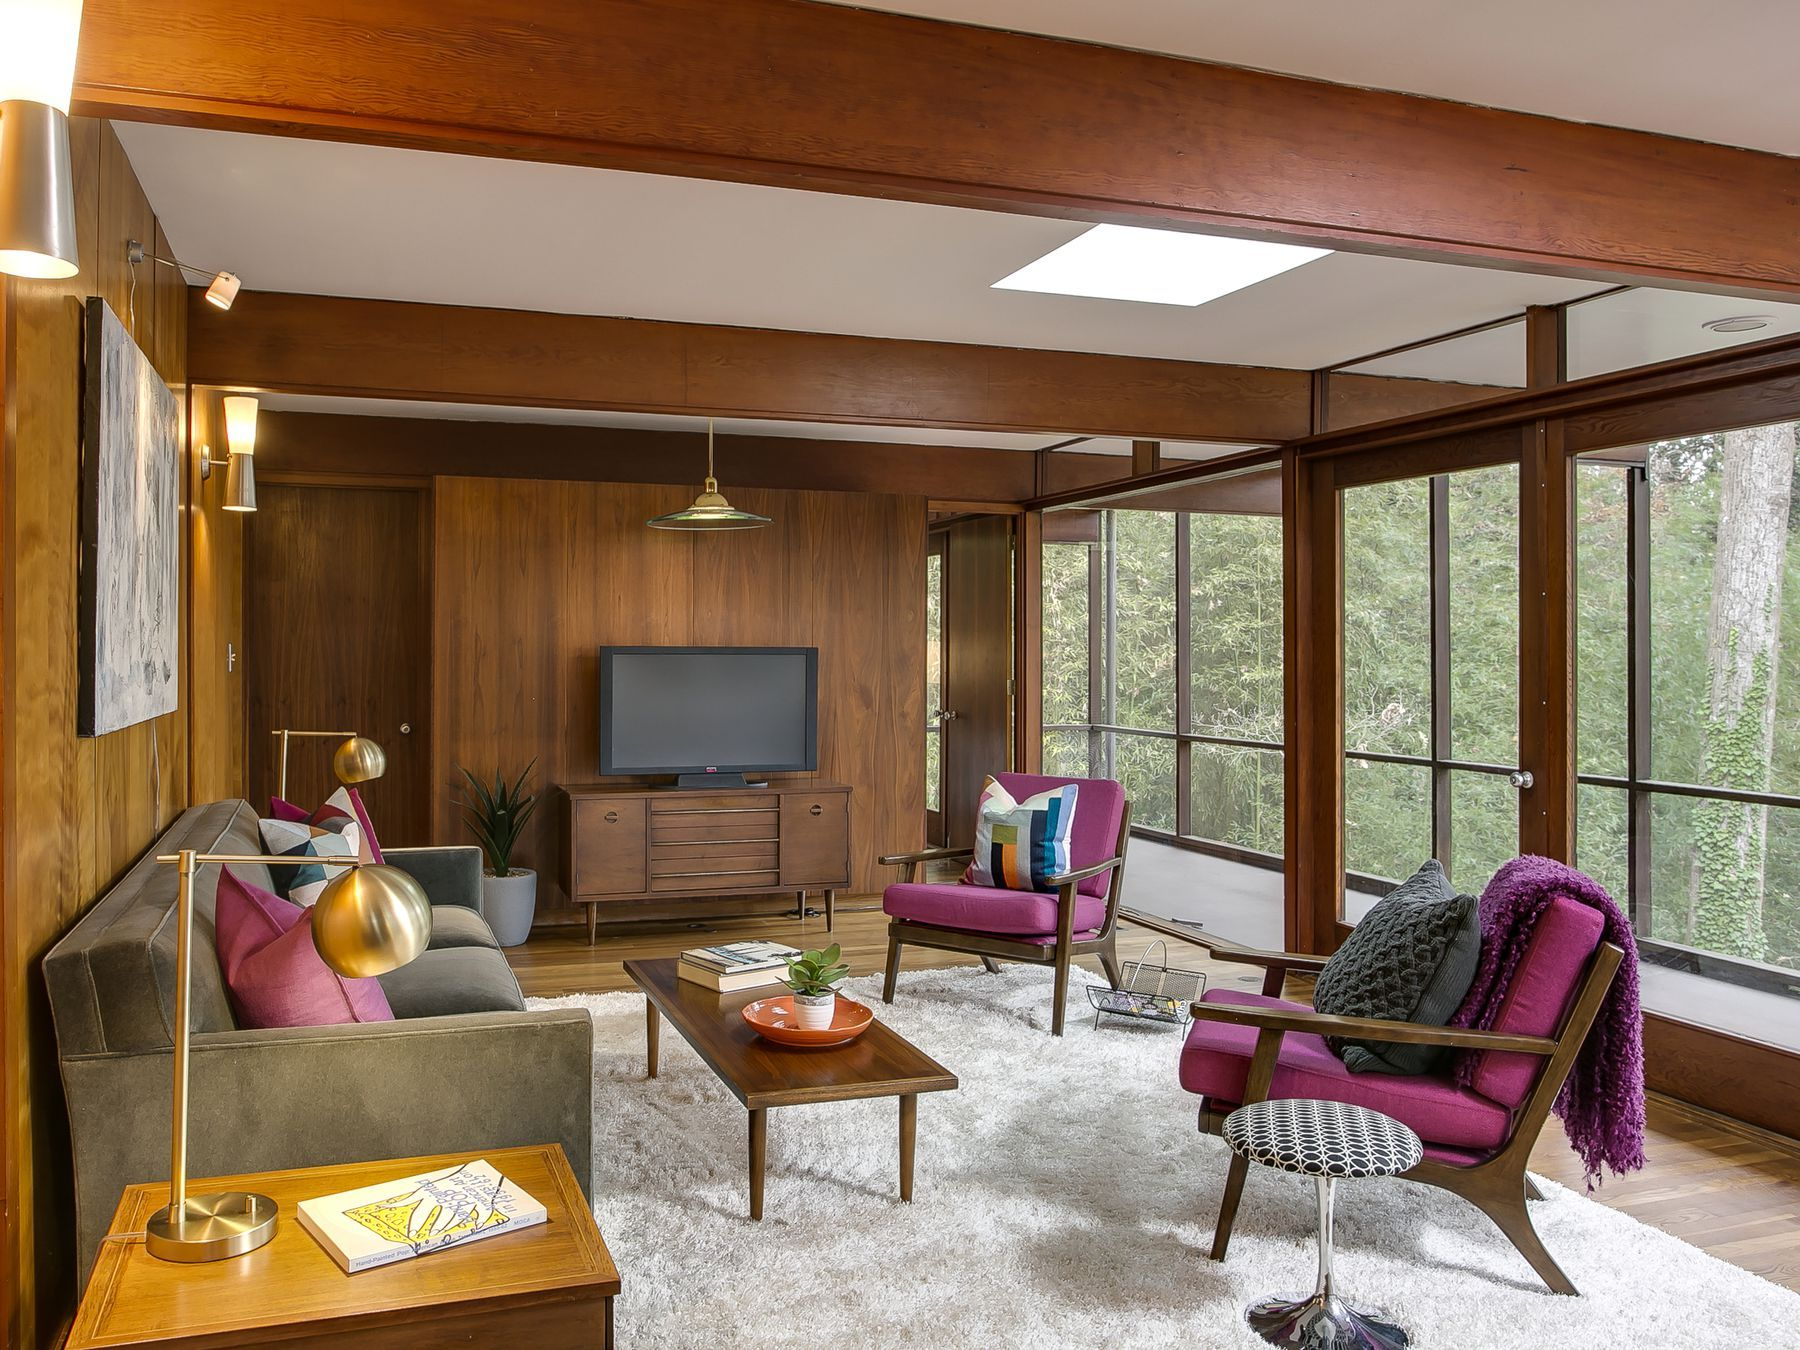 Milton Julian House, Chapel Hill, NC, USA (1954) Architect: George Matsumoto